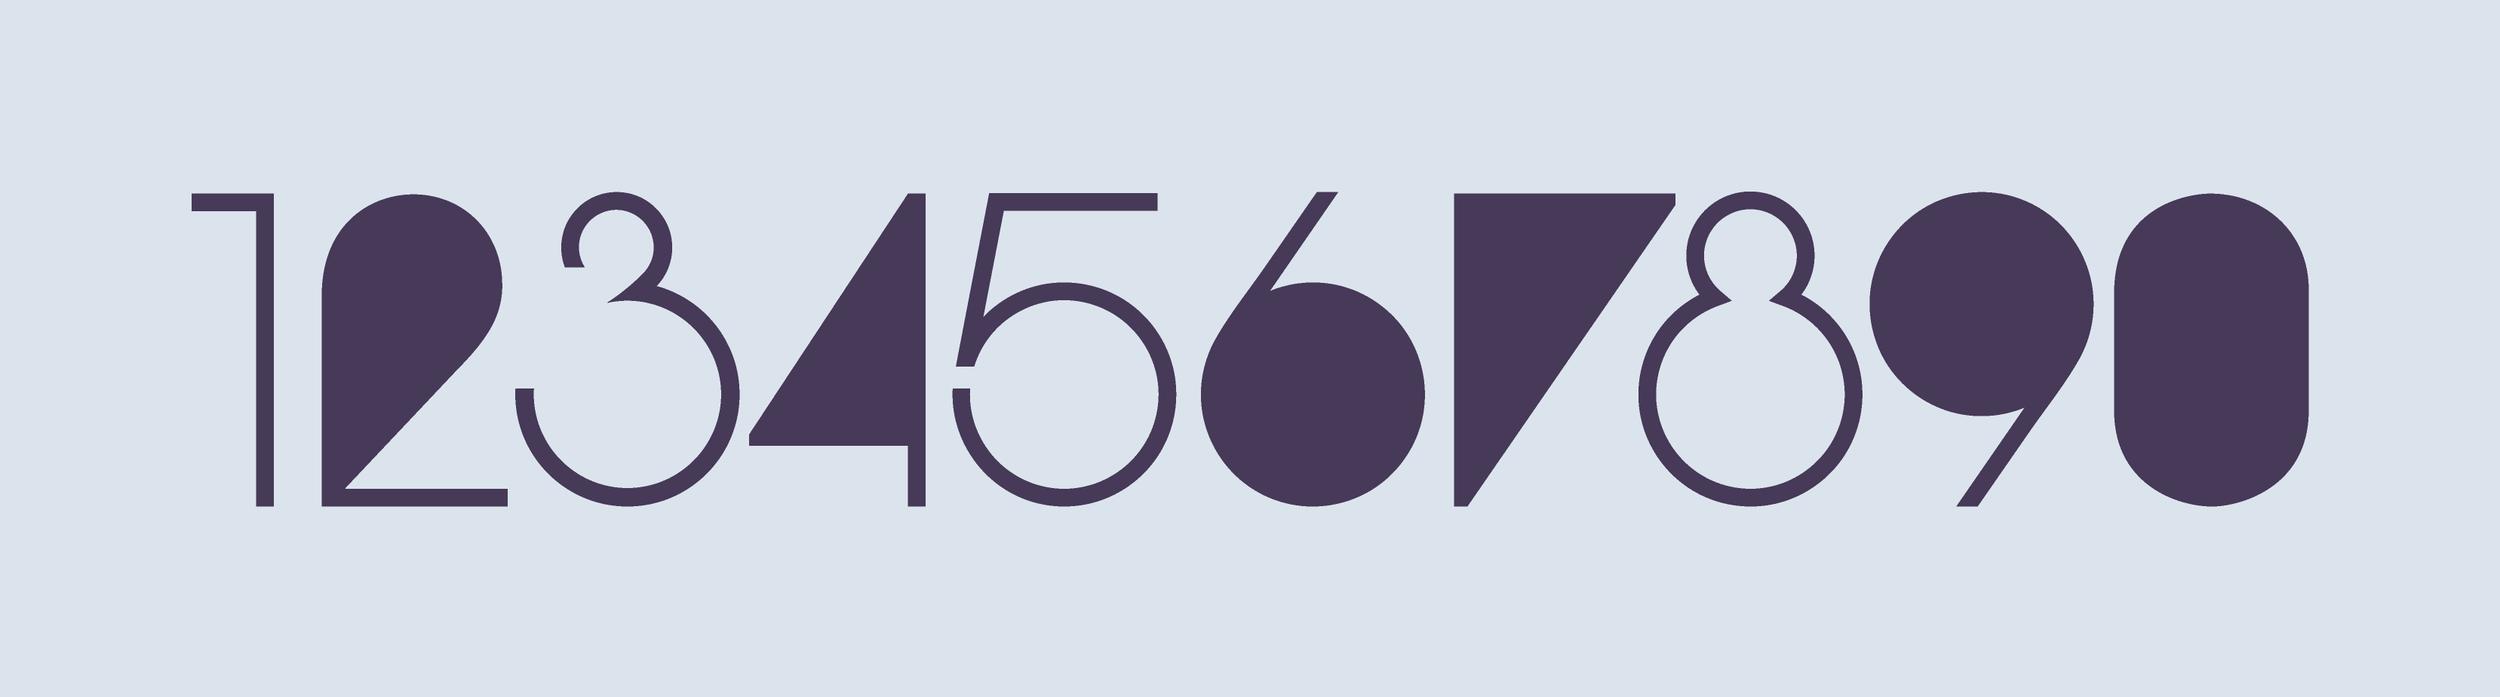 Numbers_Set_Justin-Harder.png